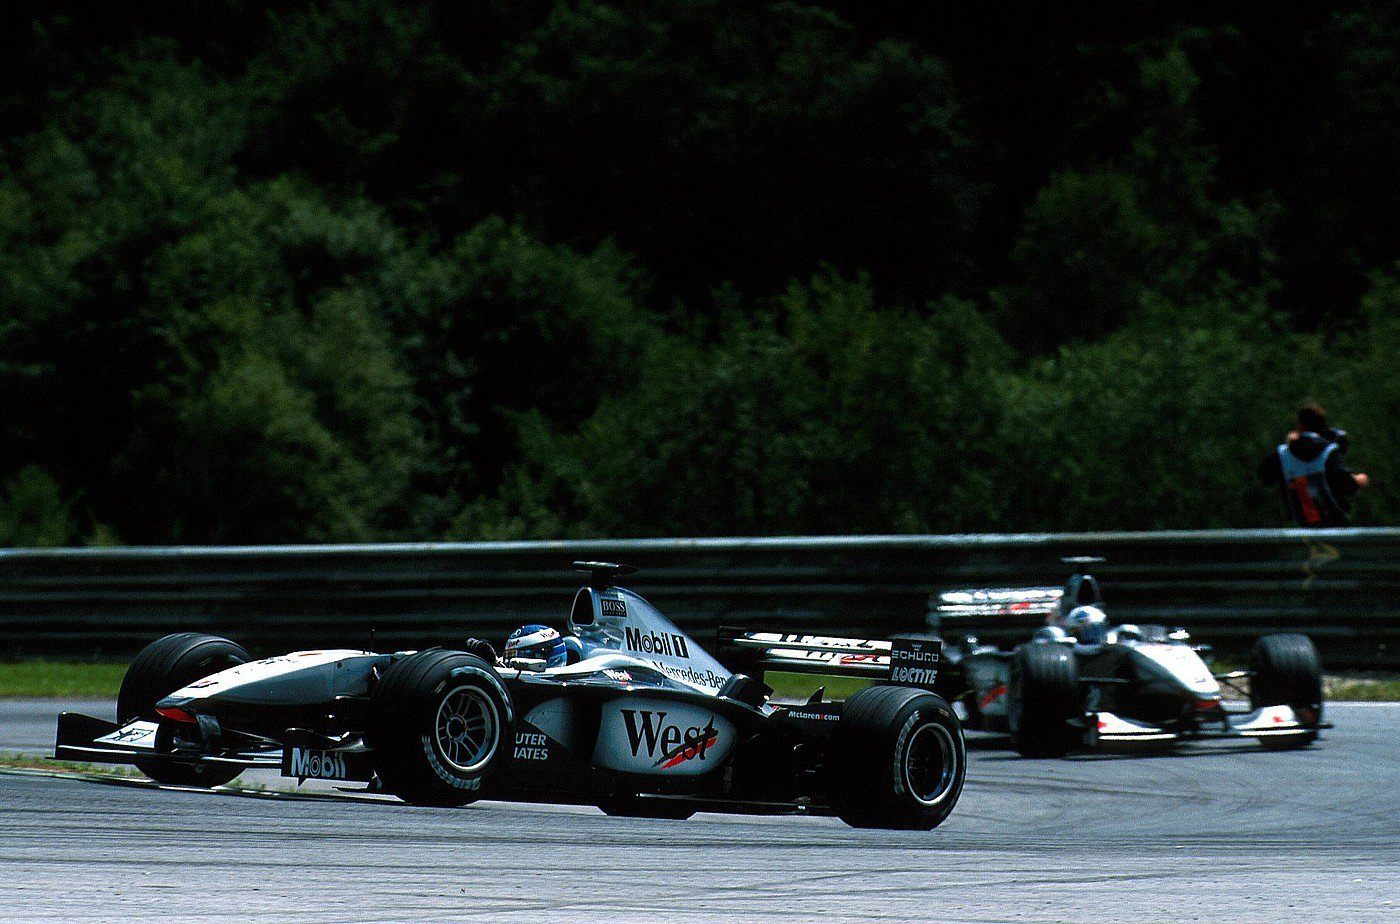 10 Austrian Grand Prix Austria A1-Ring, Spielberg 7 941.jpg